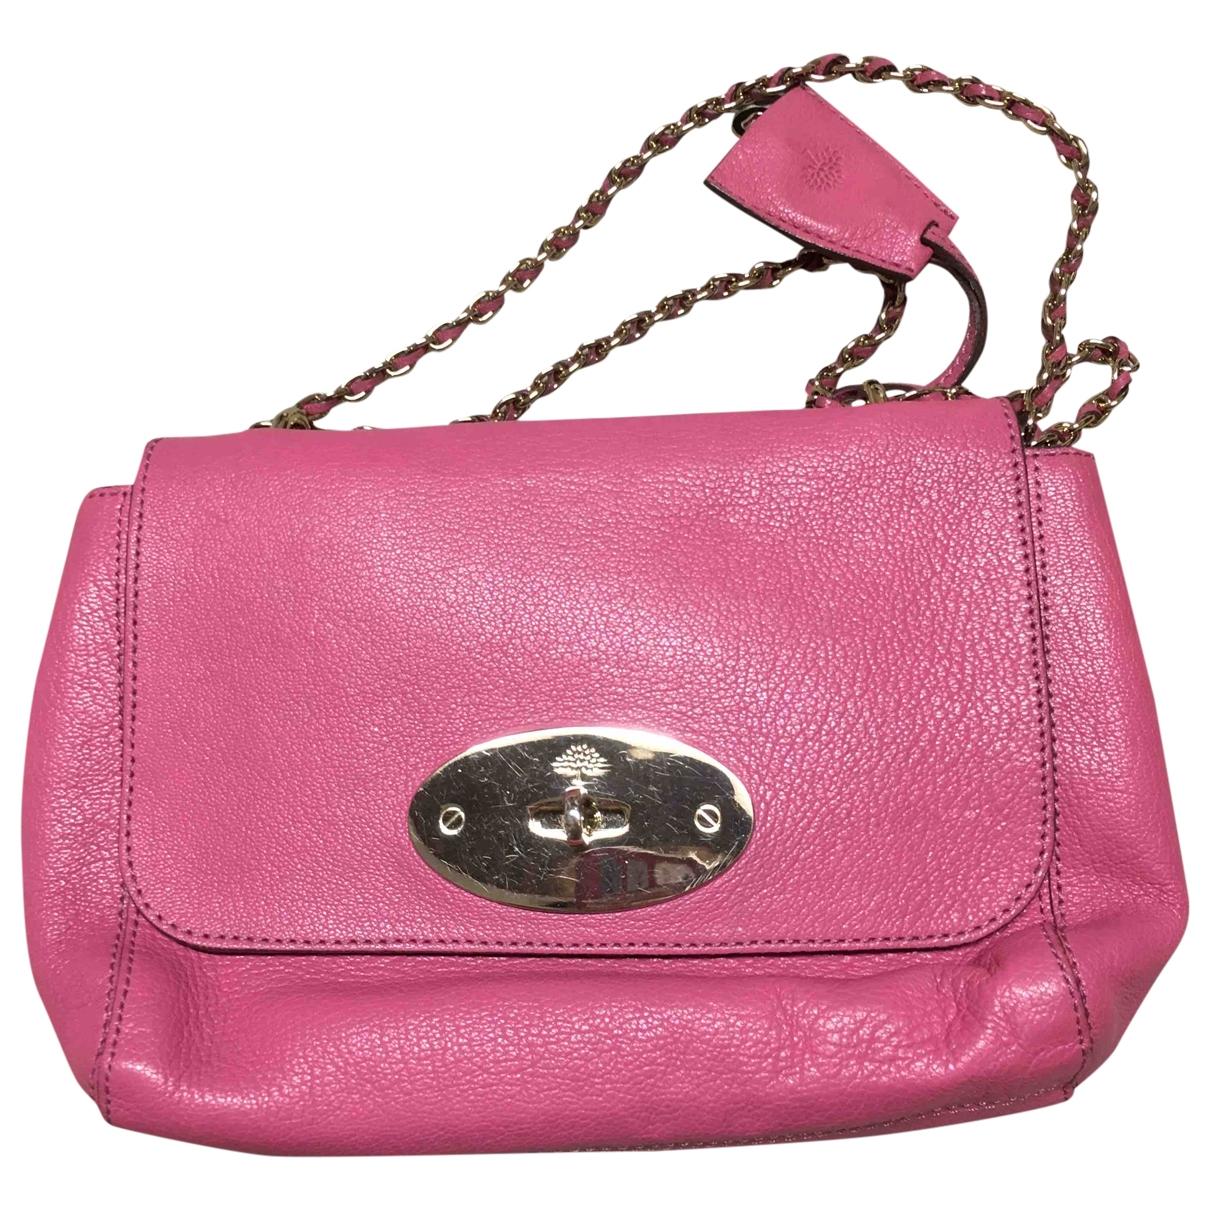 Mulberry Lily Handtasche in  Rosa Leder